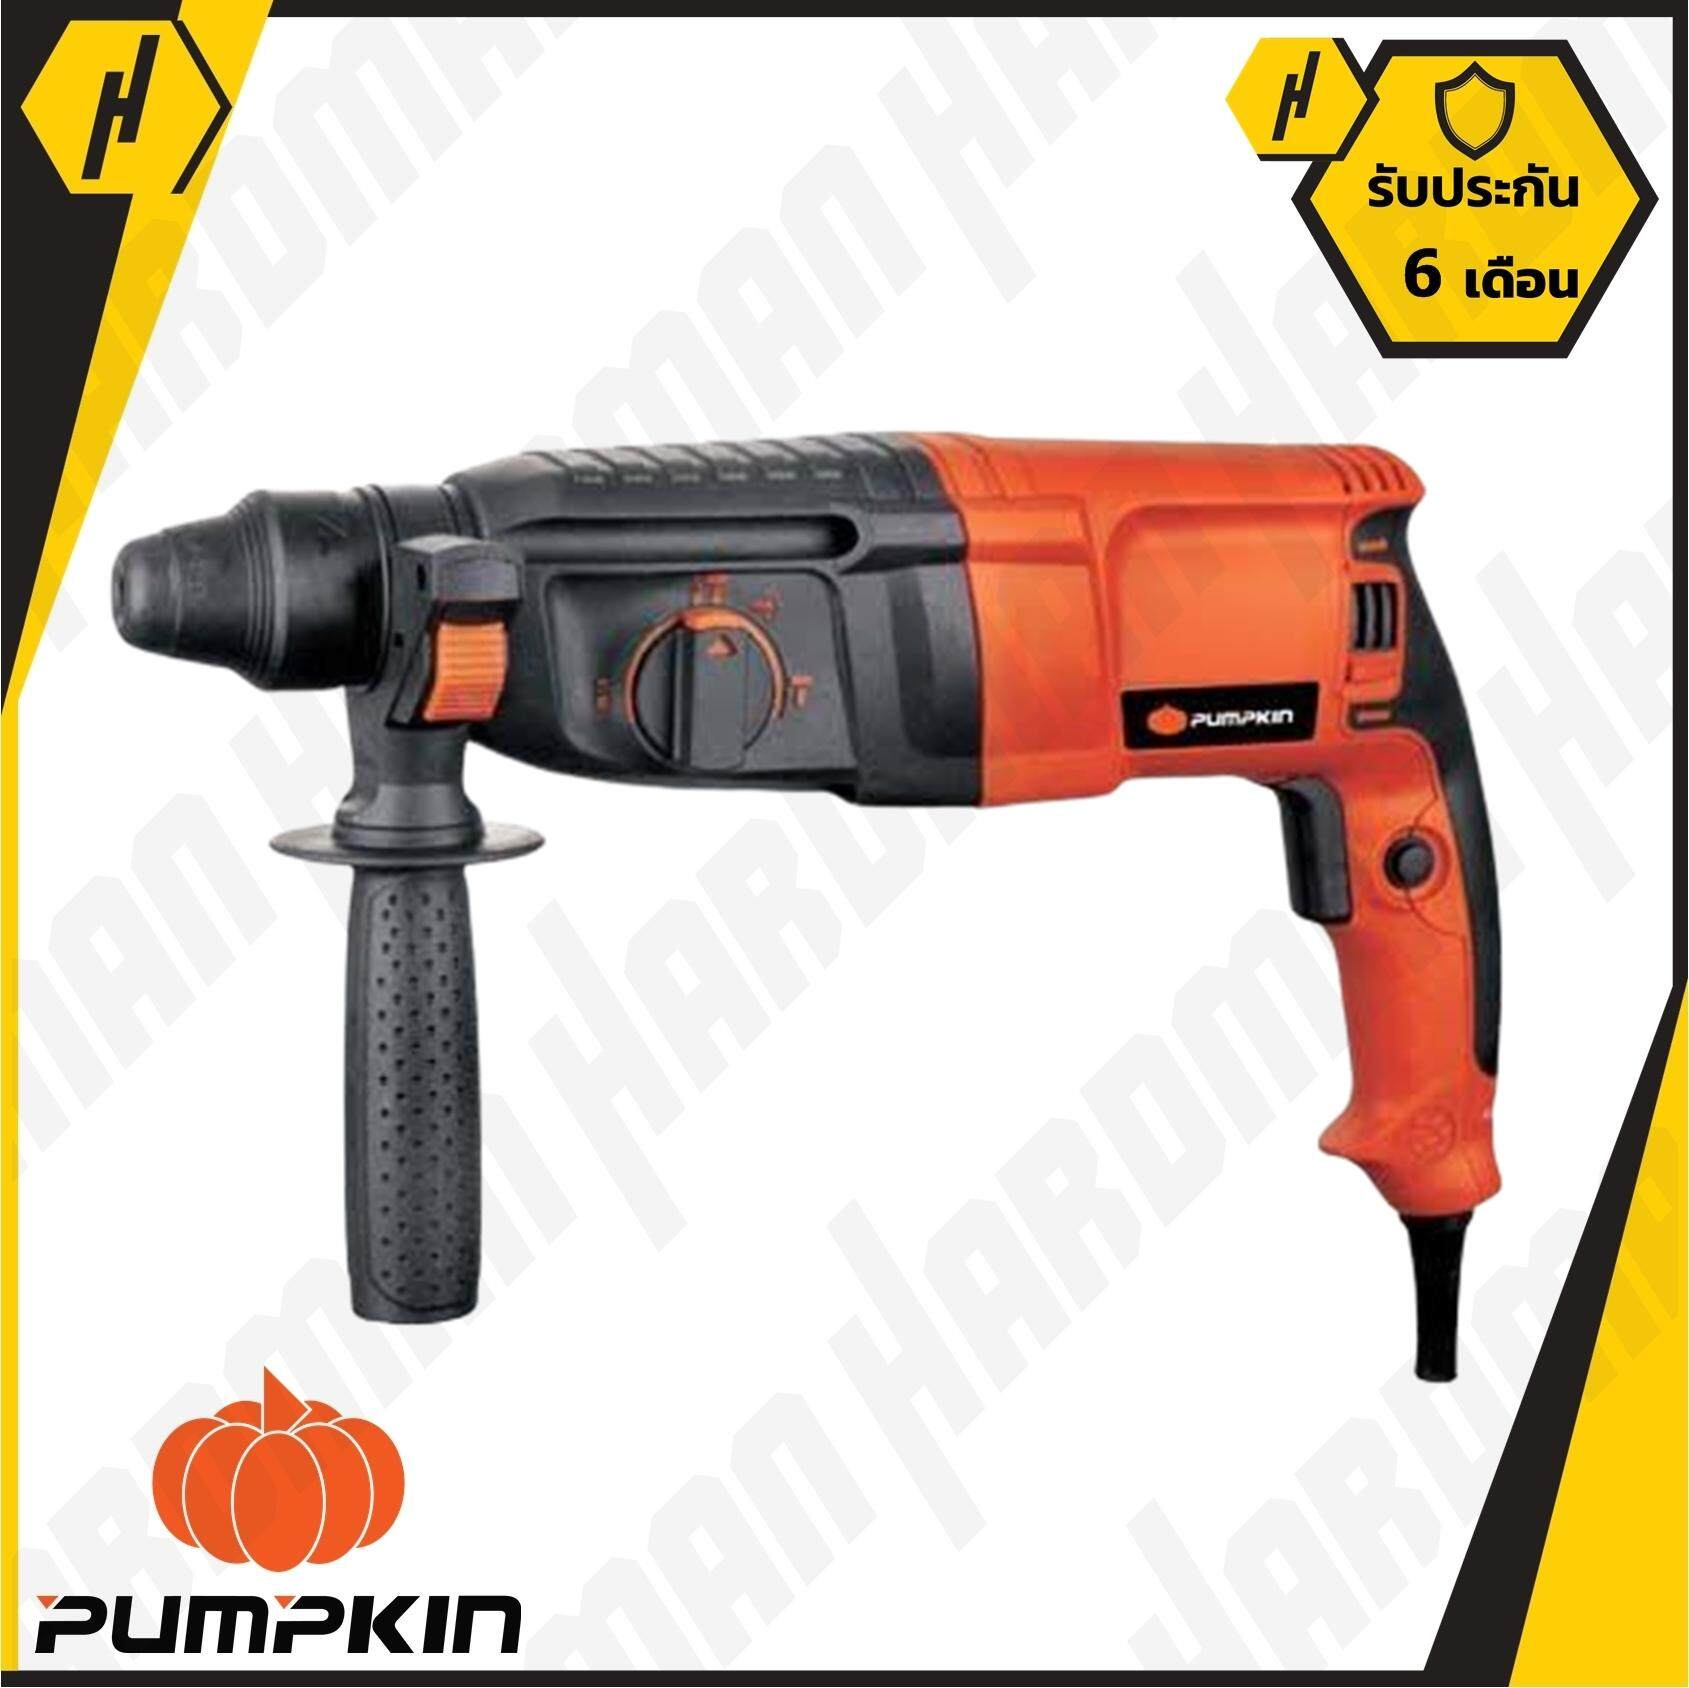 PUMPKIN PTT2-26 DRE สว่านโรตารี่ 26 มม. 3 ระบบ 800 W พร้อมอุปกรณ์เสริม